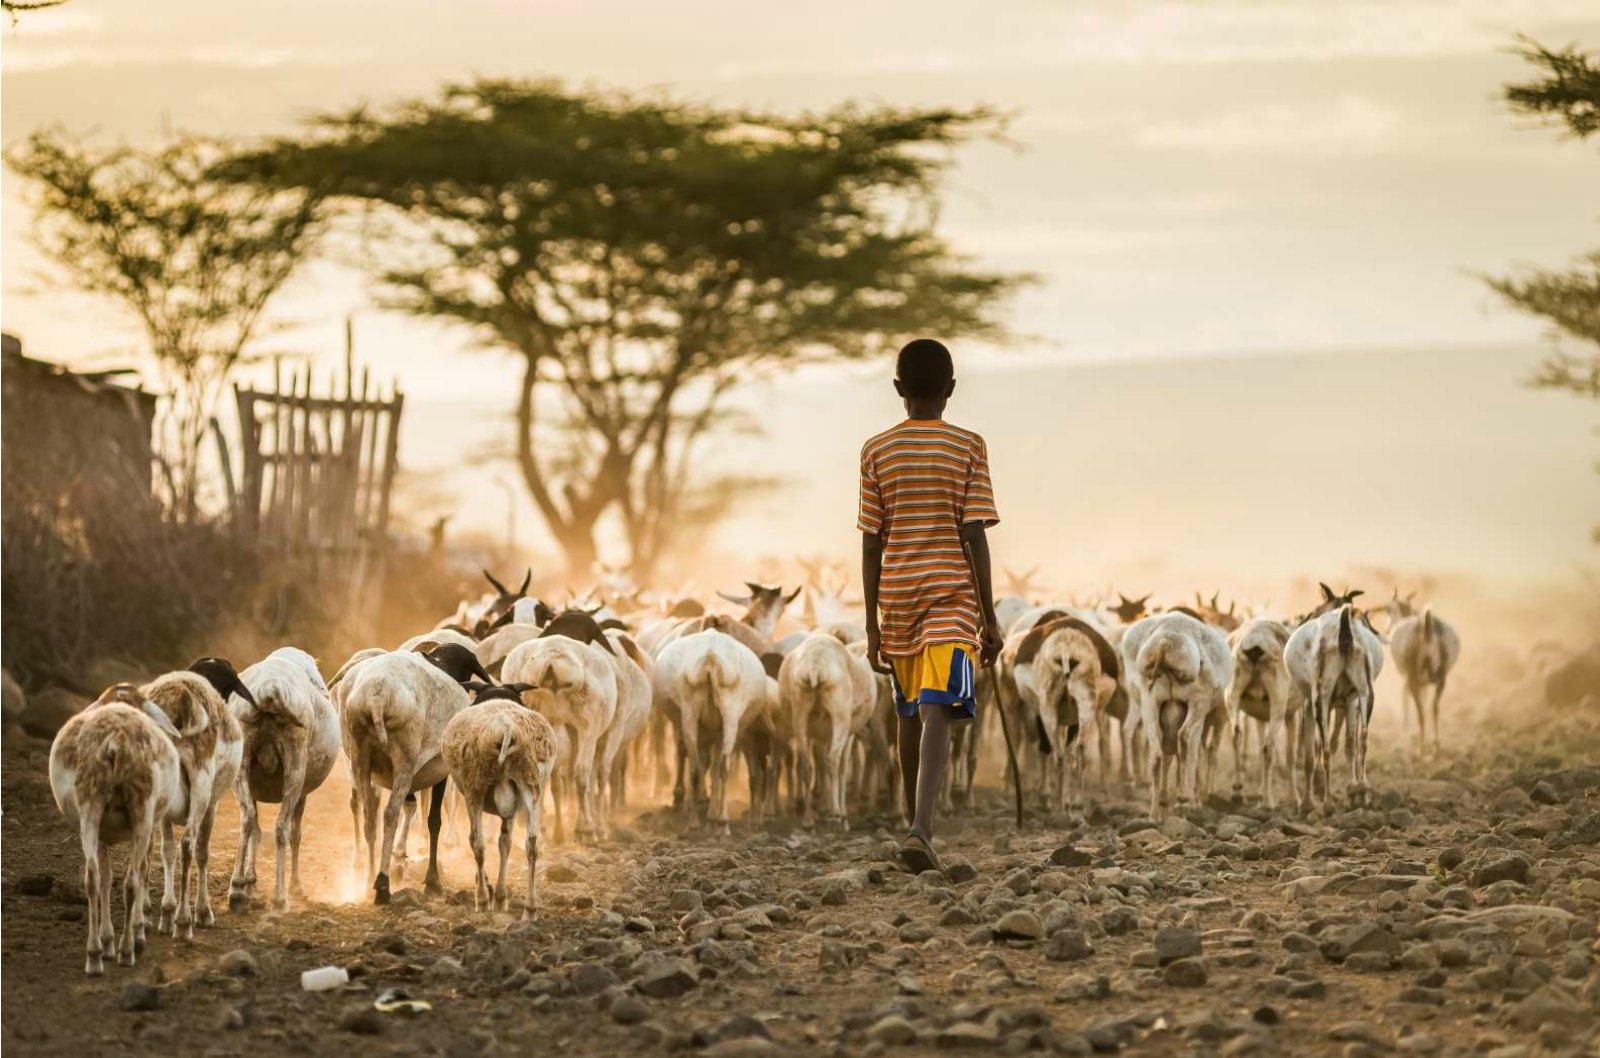 Diagnostic Breakthrough Unmasks a Killer in Sub-Saharan Africa